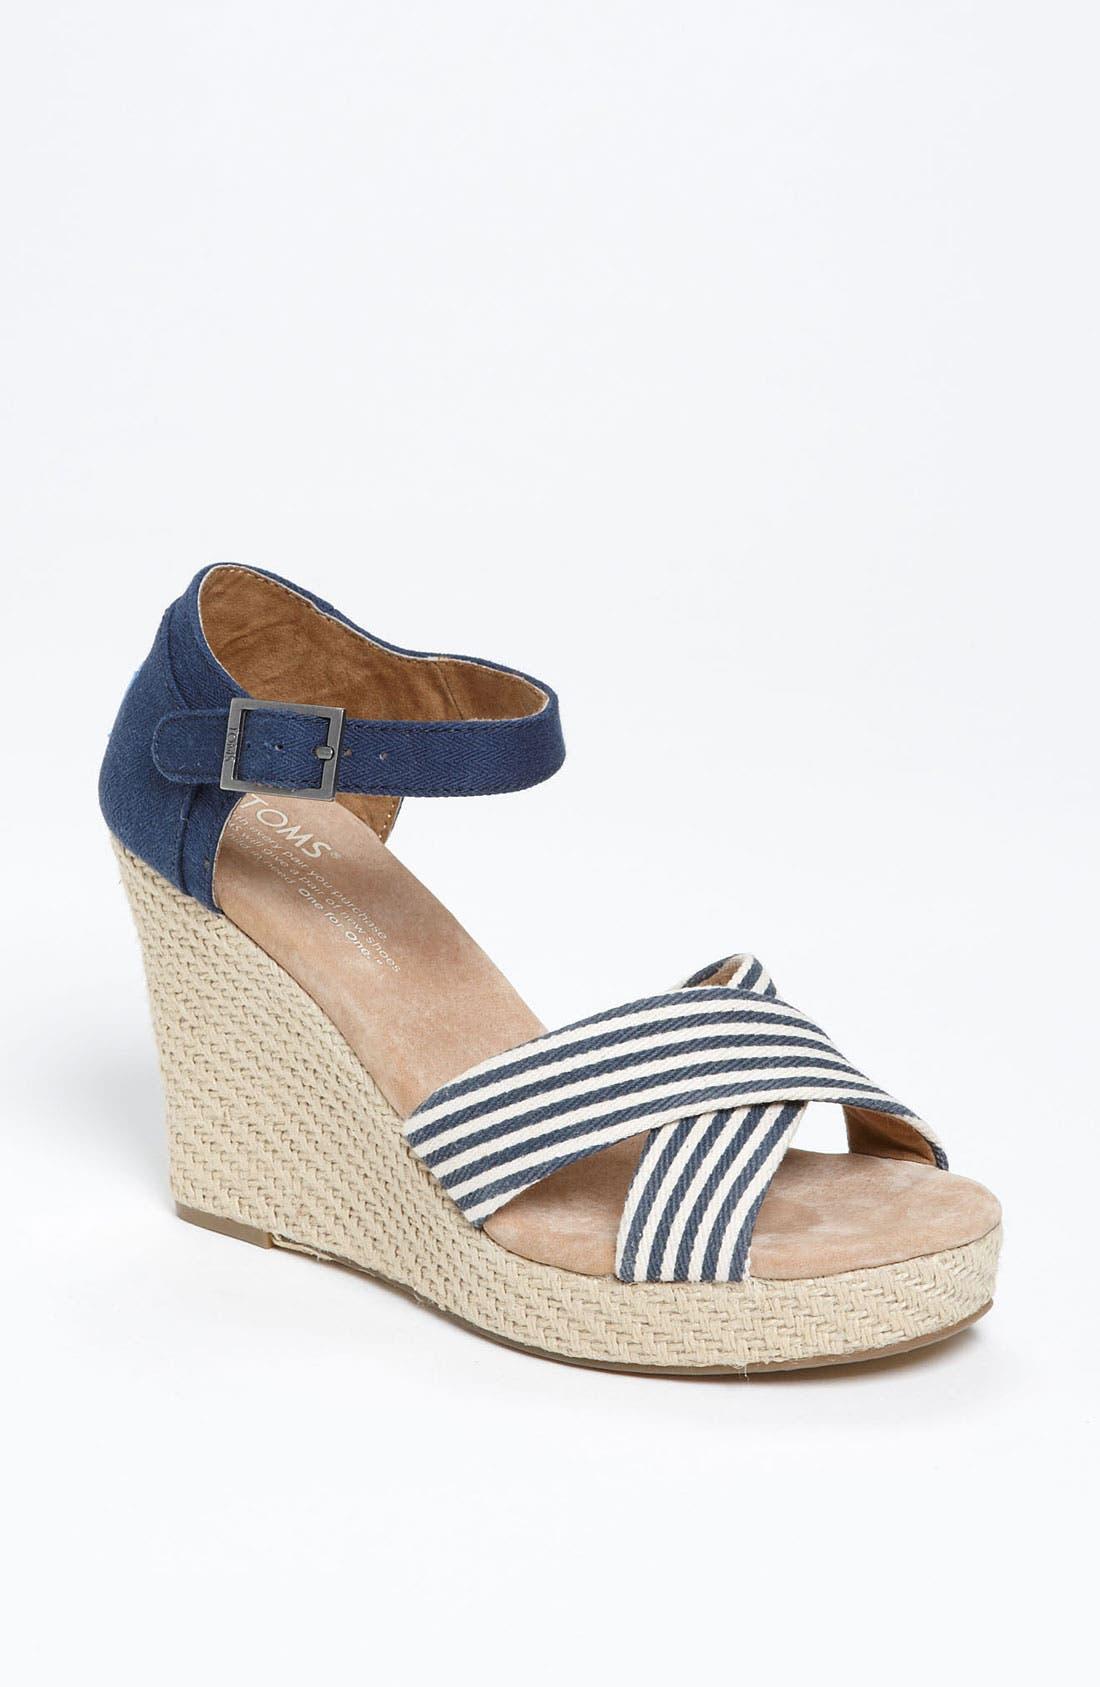 Alternate Image 1 Selected - TOMS 'University Stripe' Sandal